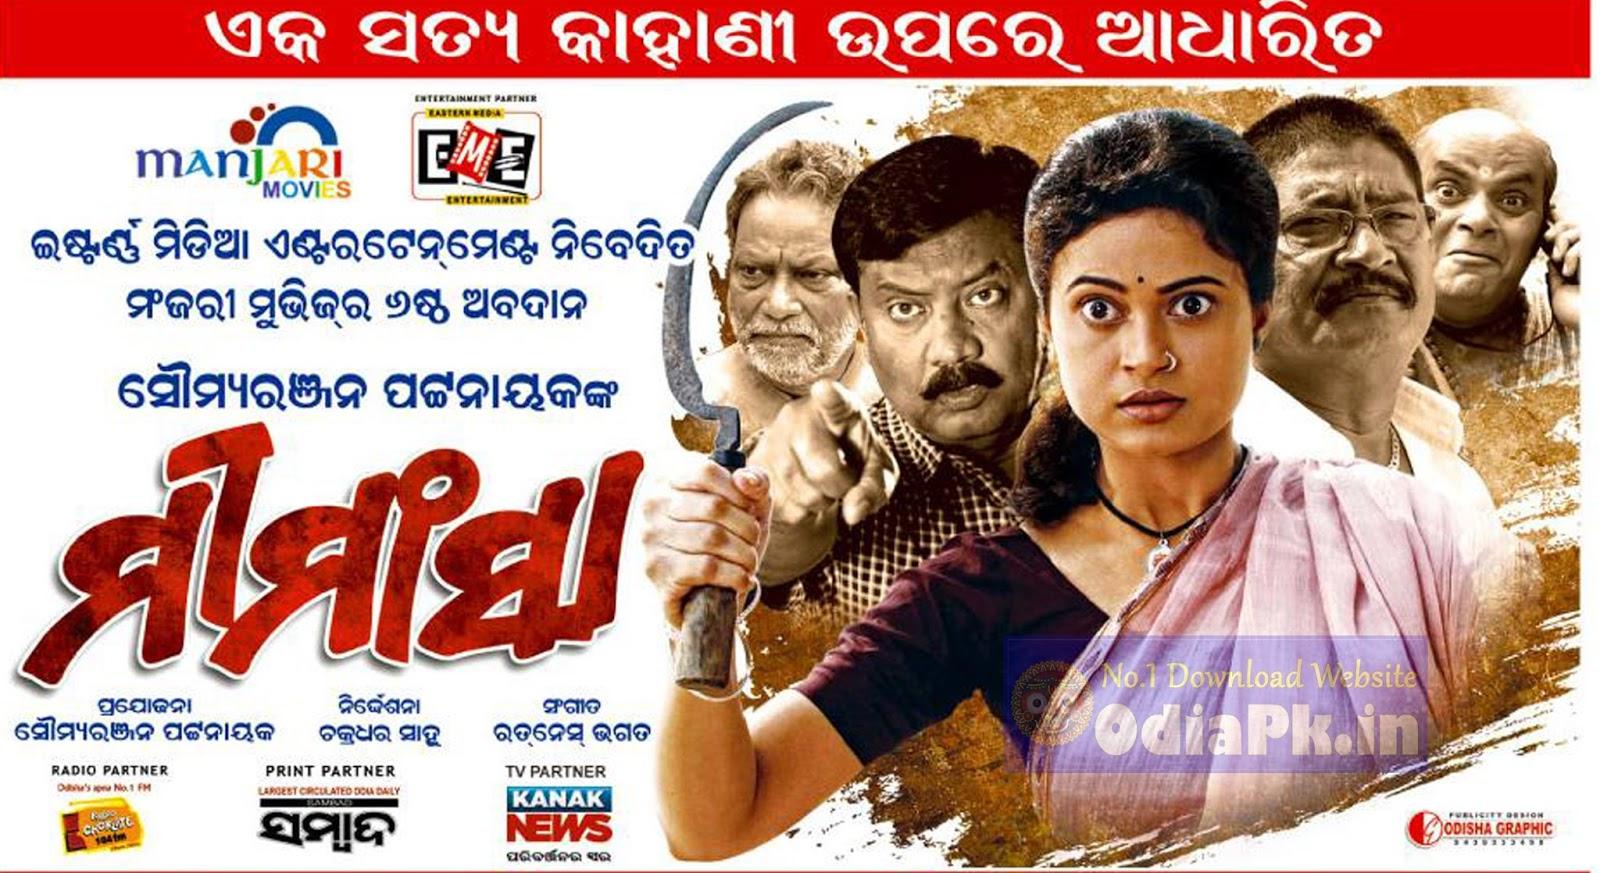 Kalank Release Date Preponed Mp3: Mimansa (2016) Odia Film Mp3,cast,crew,wallpaper,video